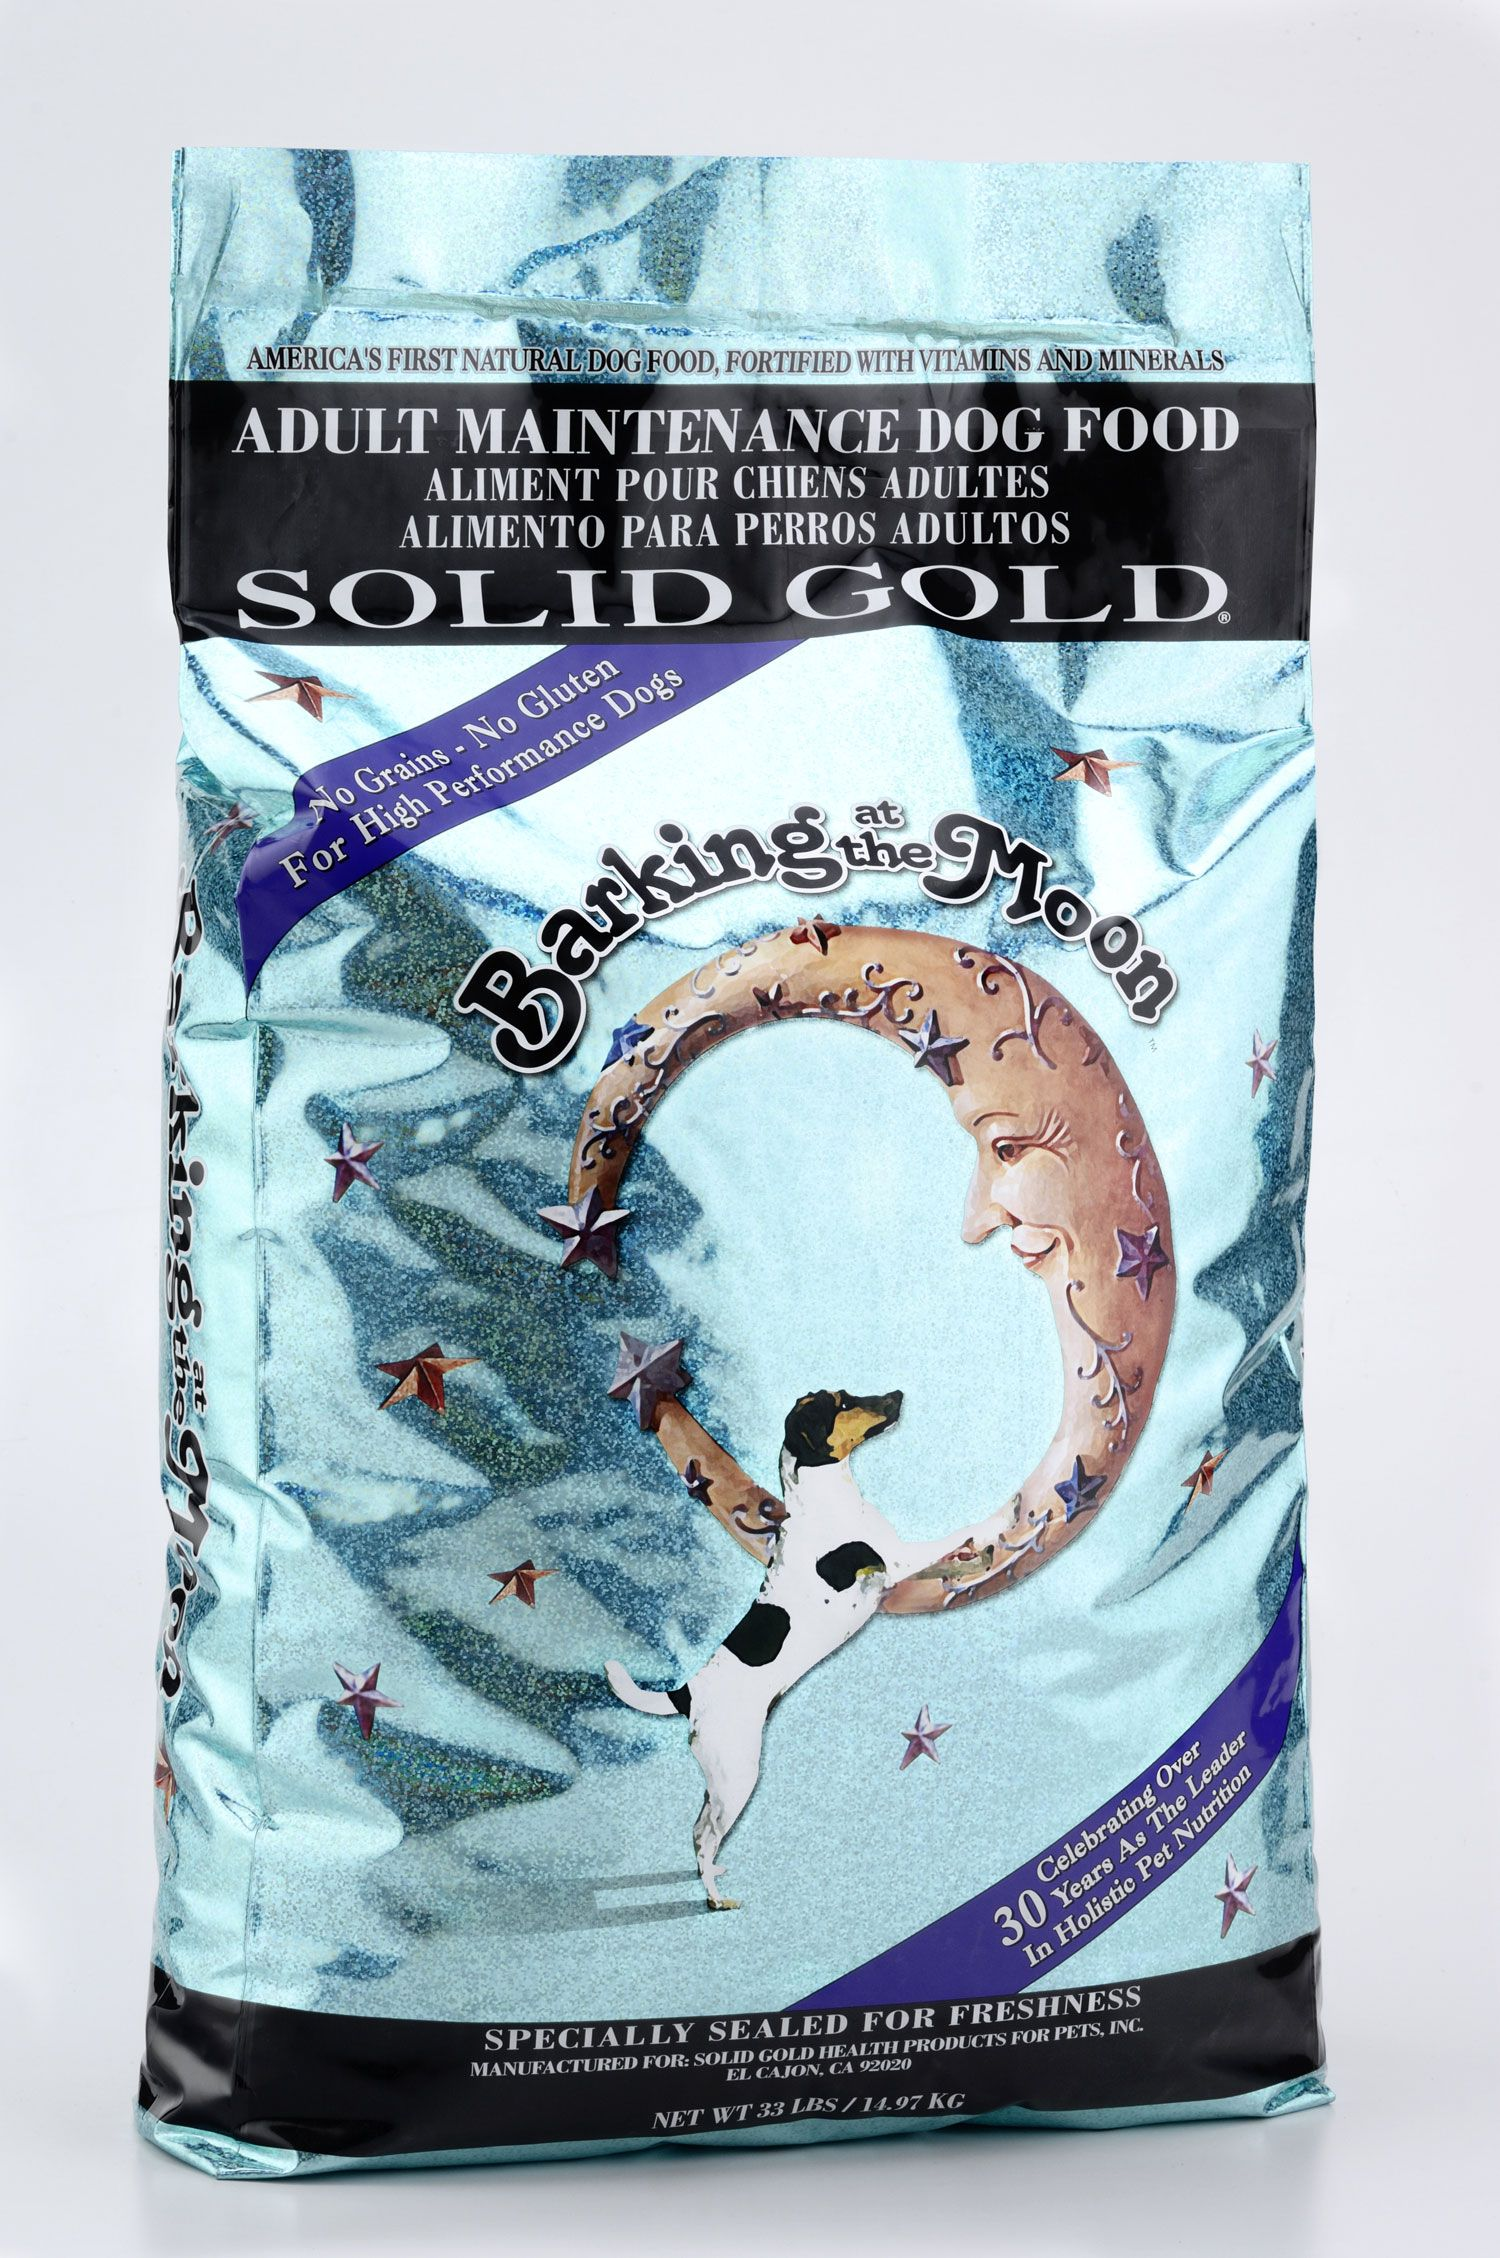 solid gold barking at the moon dog food